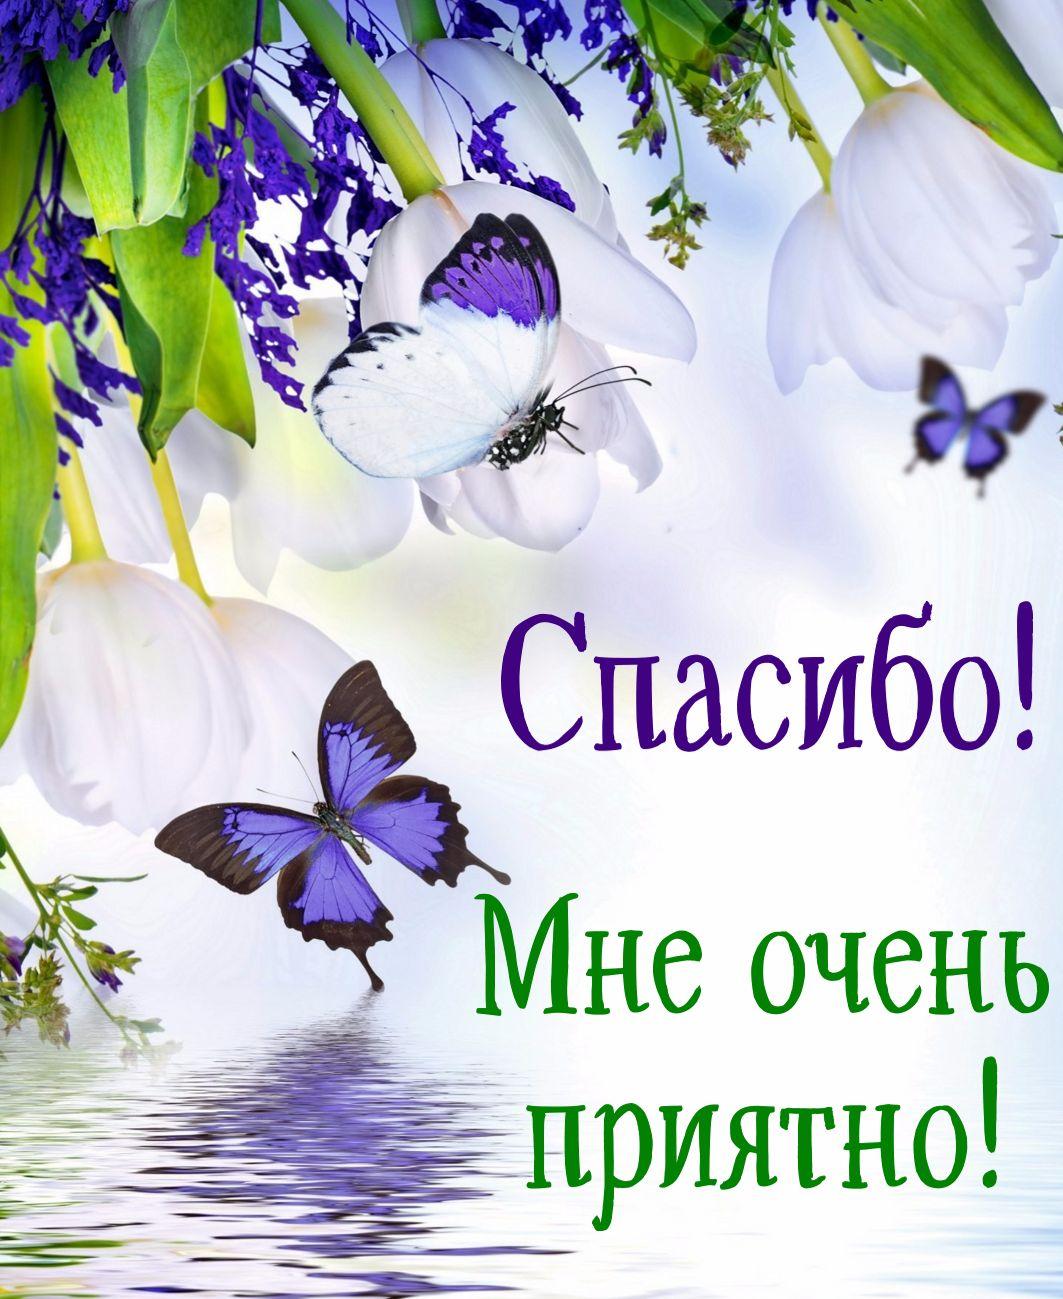 Открытка спасибо - бабочки на красивом цветочном фоне